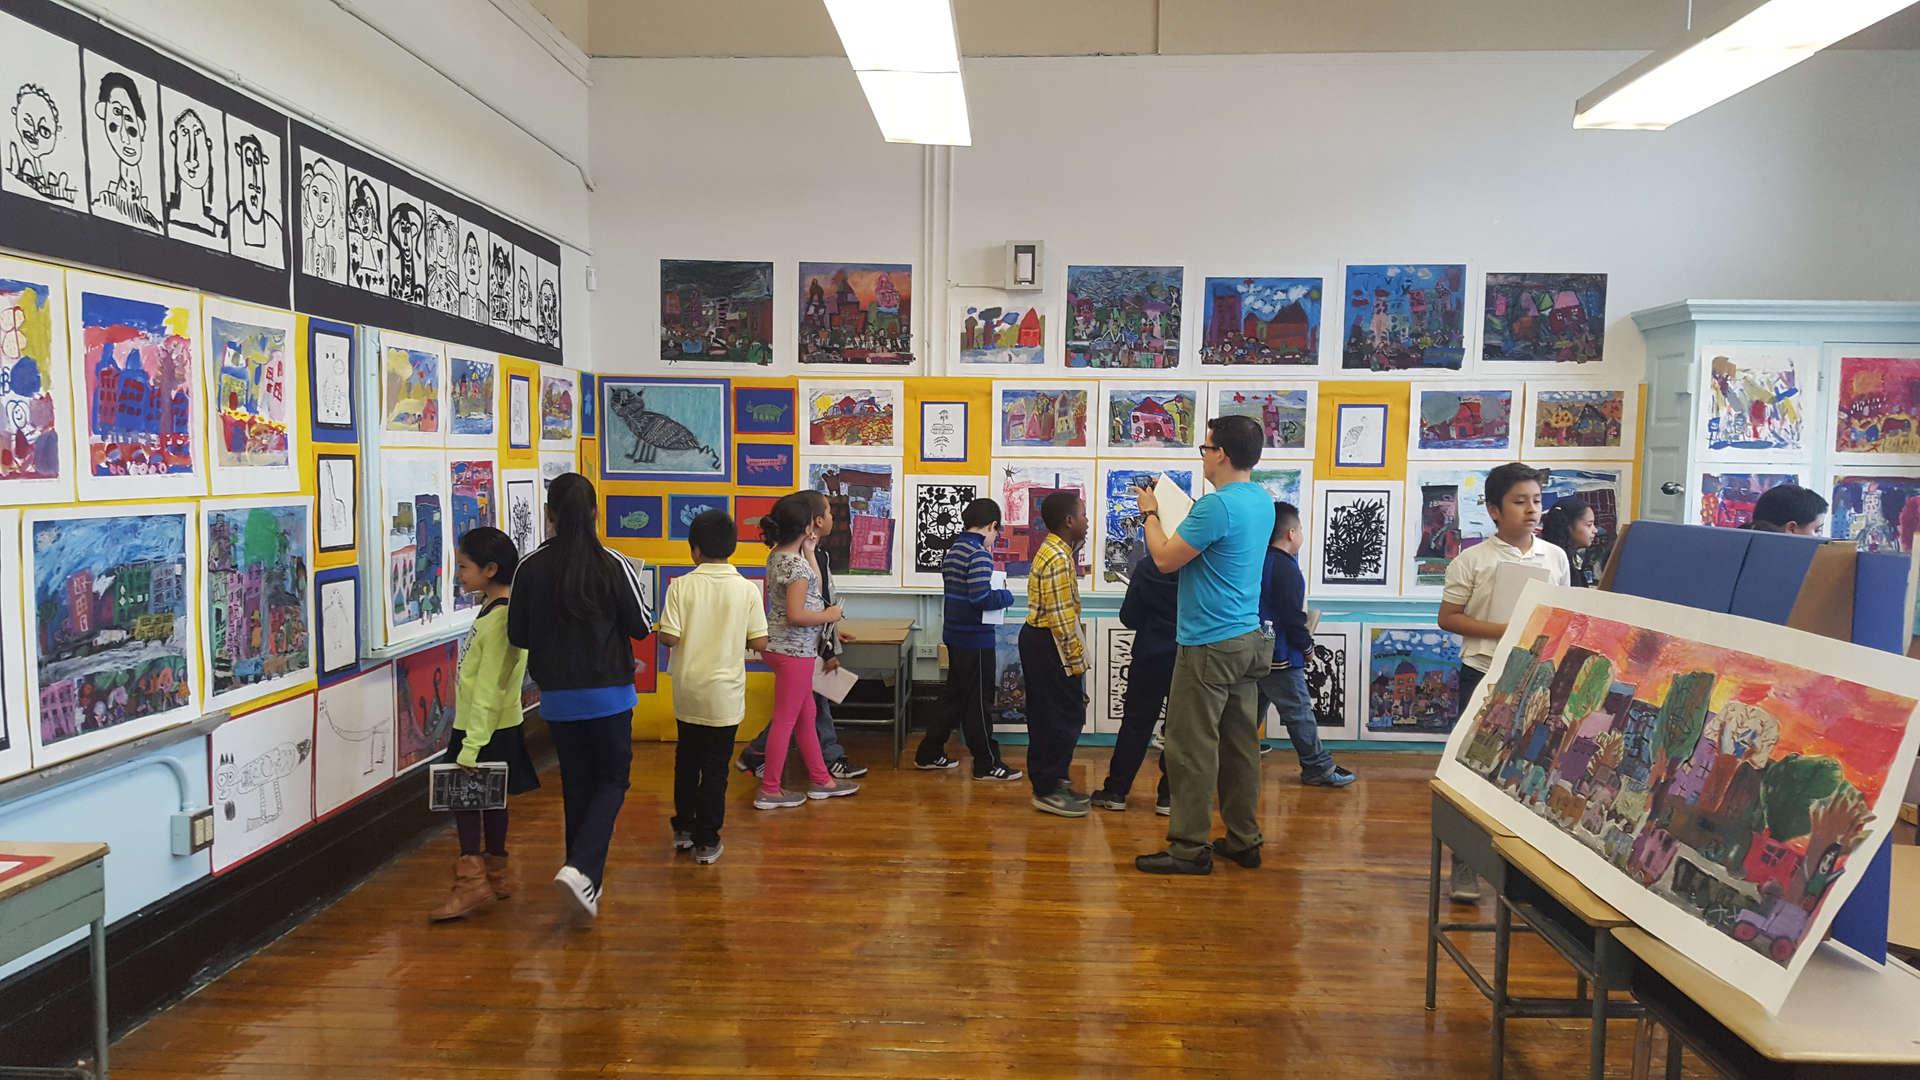 Studio in a School gallery